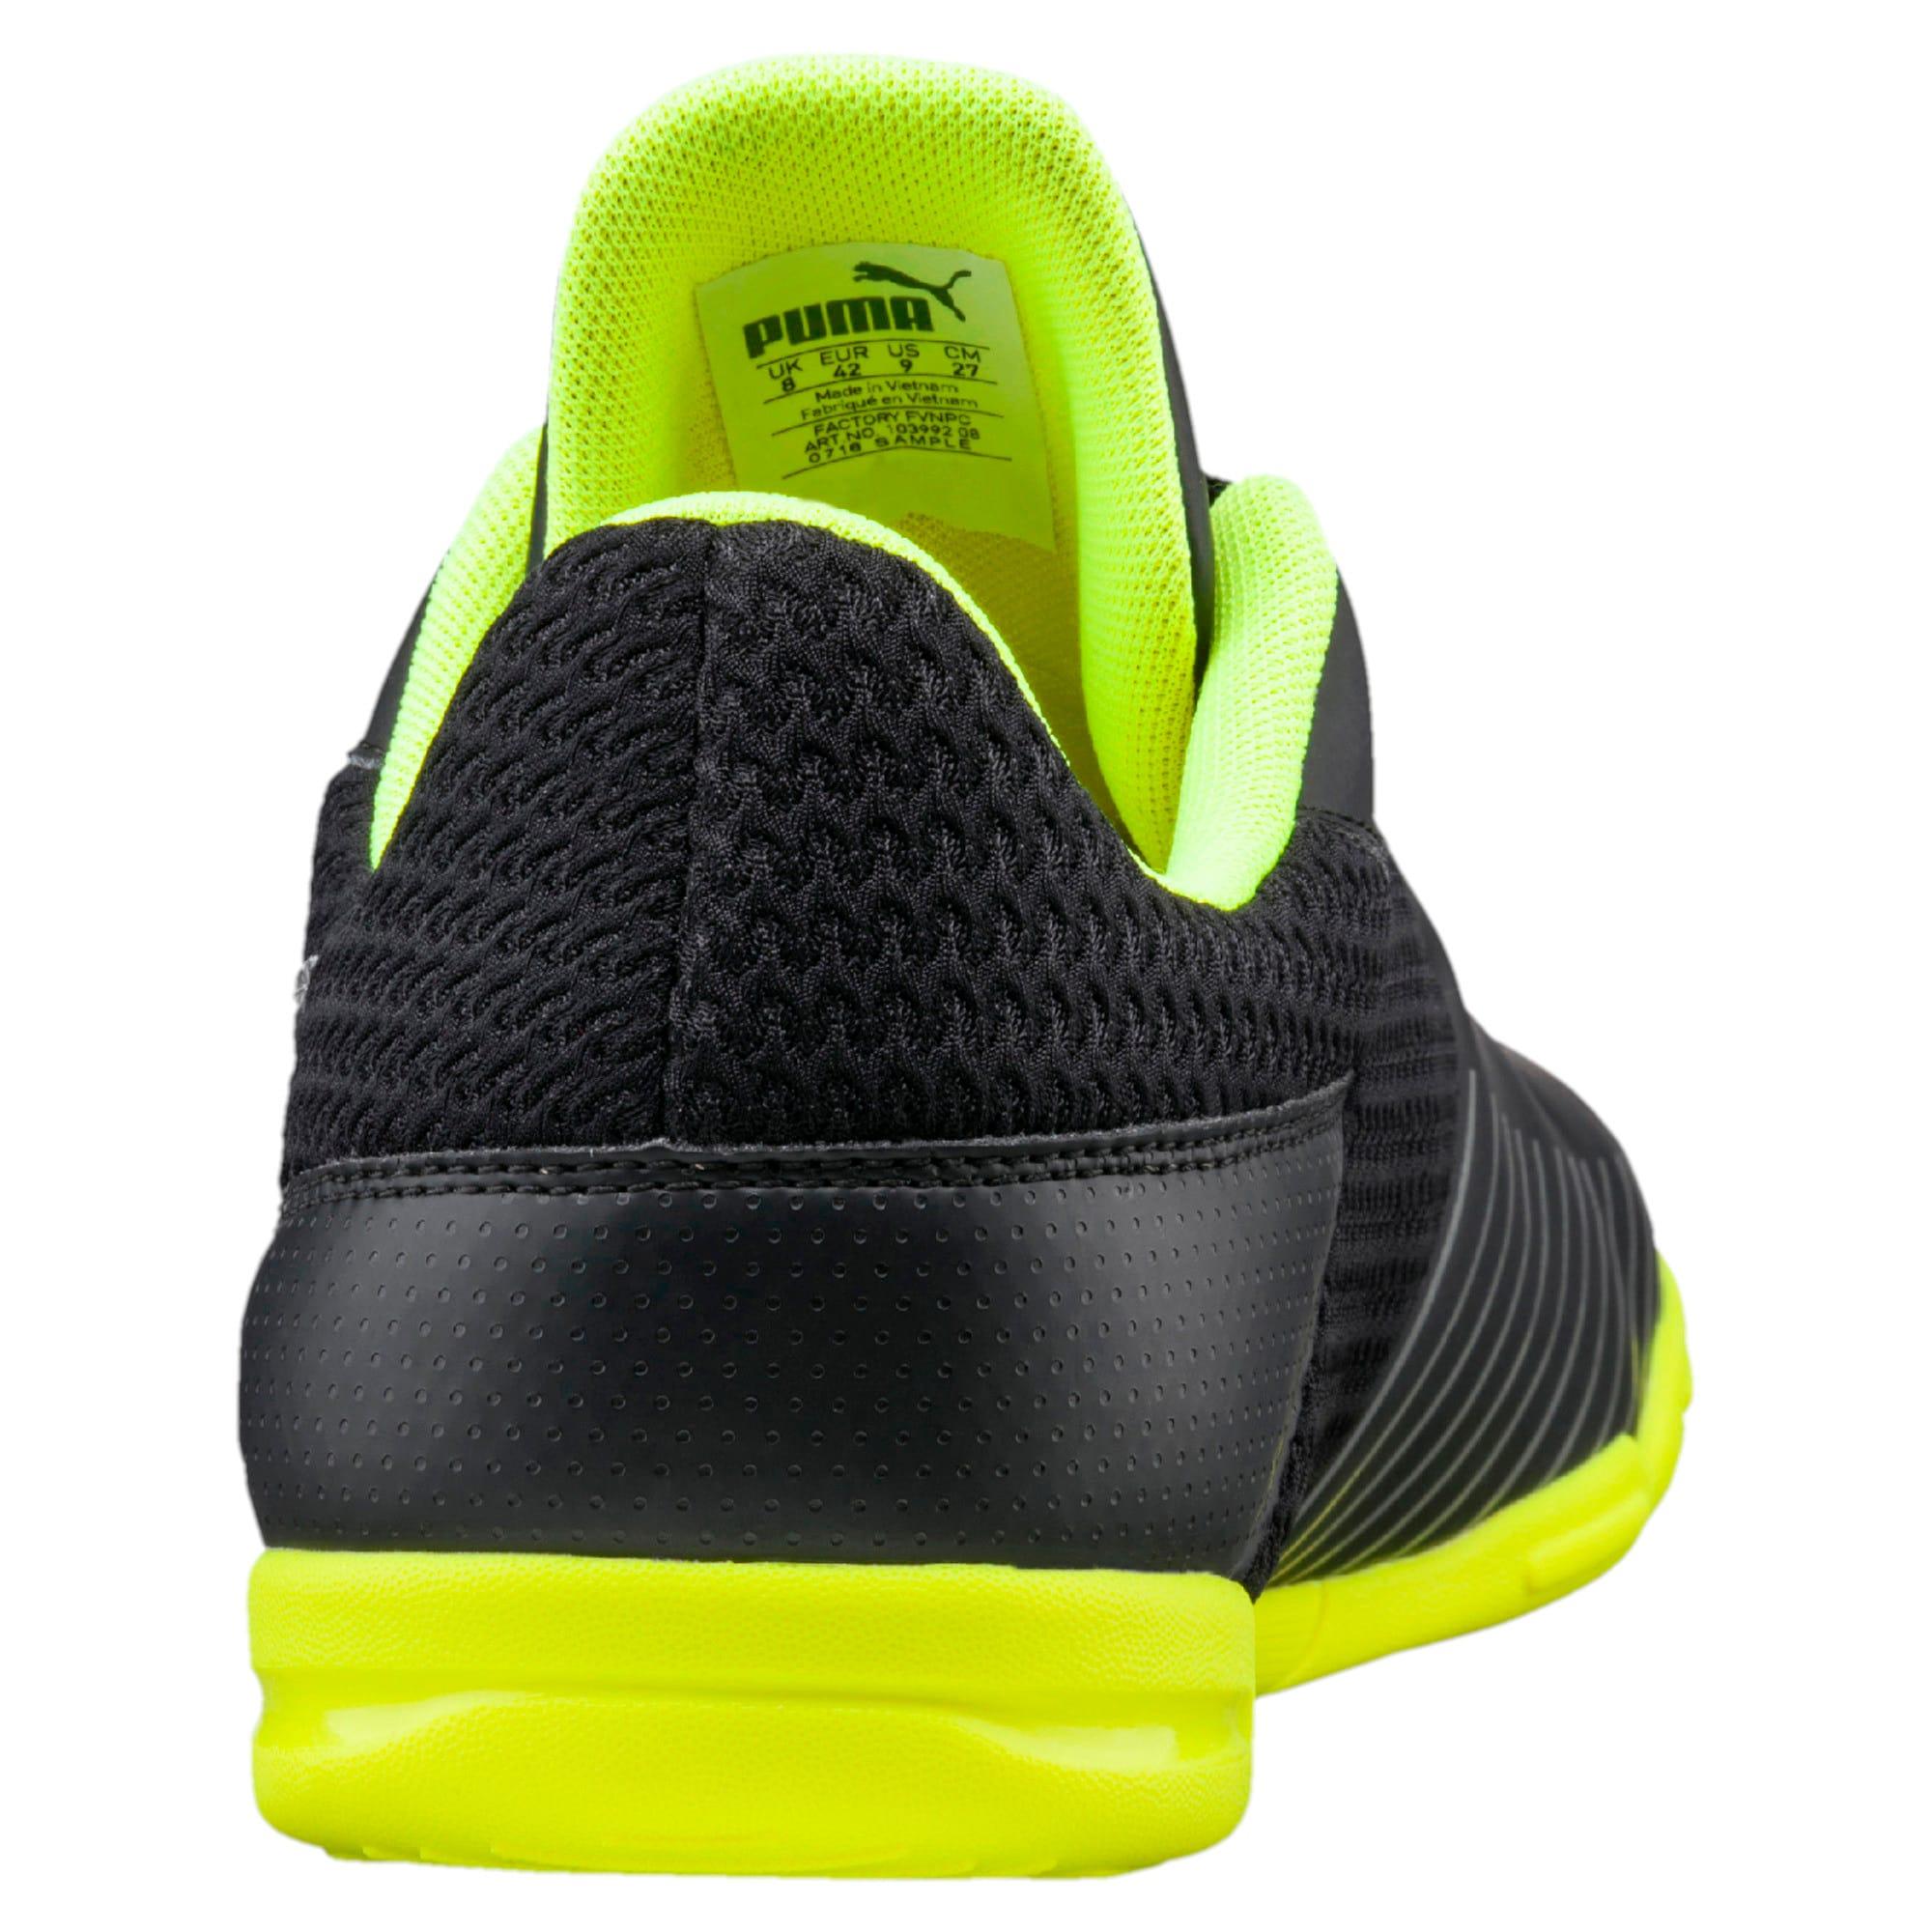 Thumbnail 3 of 365 CT Men's Court Football Shoes, Black-Black-Yellow-White, medium-IND